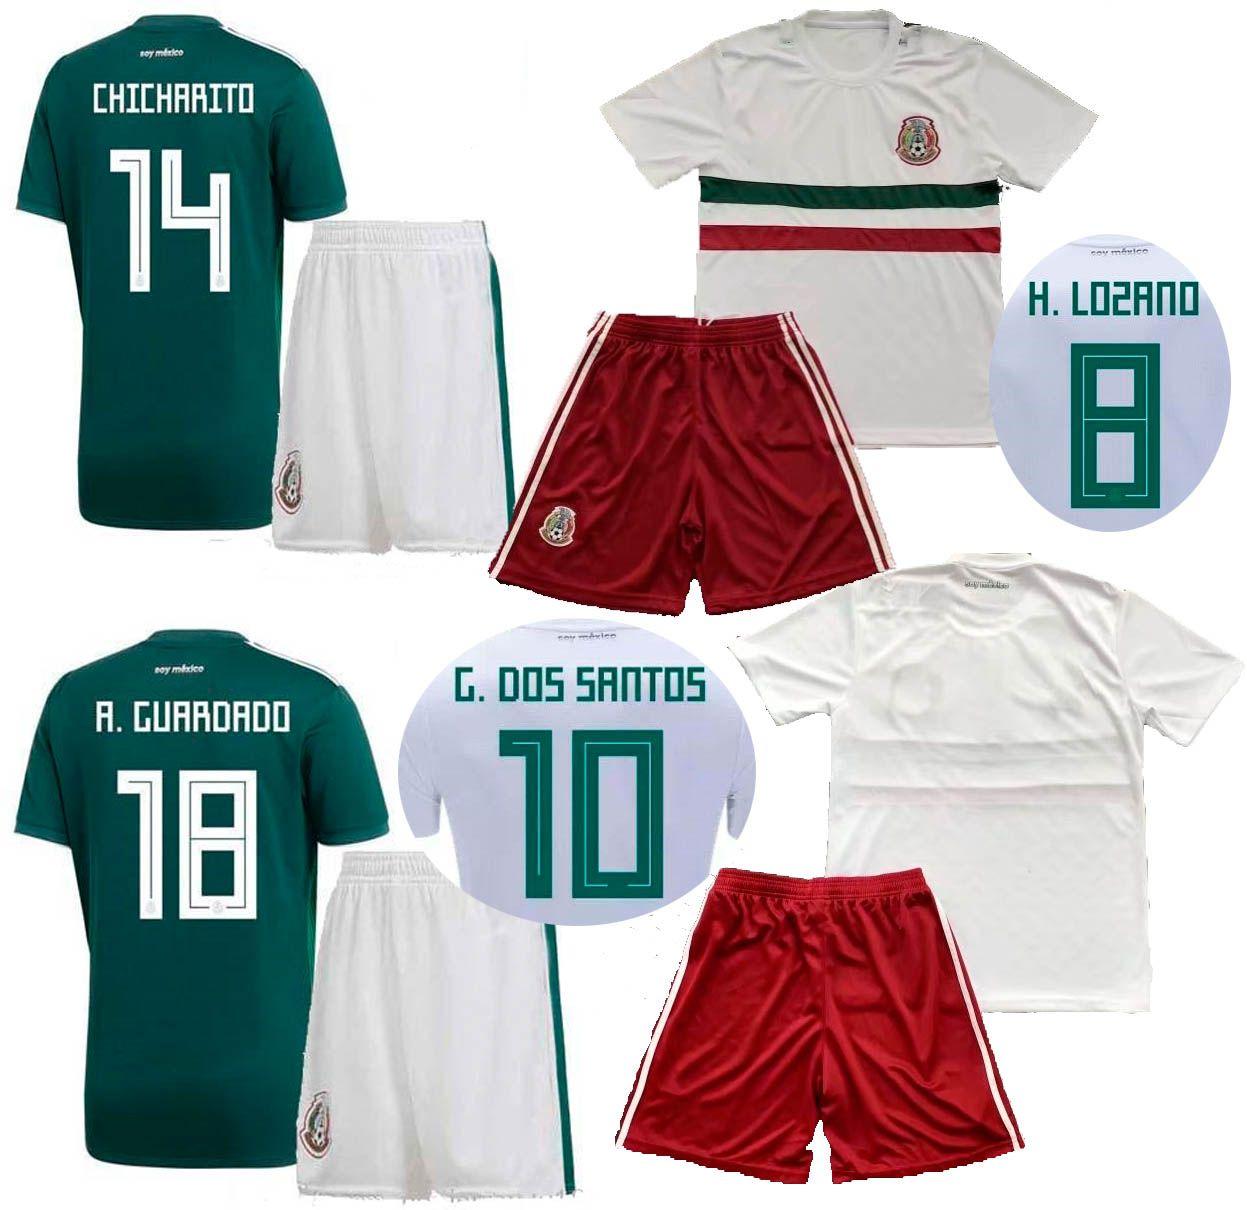 24429254c 2019 2018 World Cup Mexico Home Away Soccer Jerseys Shorts CHICHARITO LOZANO  DOS SANTOS HERRERA LAYUN Football Sets National Team Soccer Uniform From ...